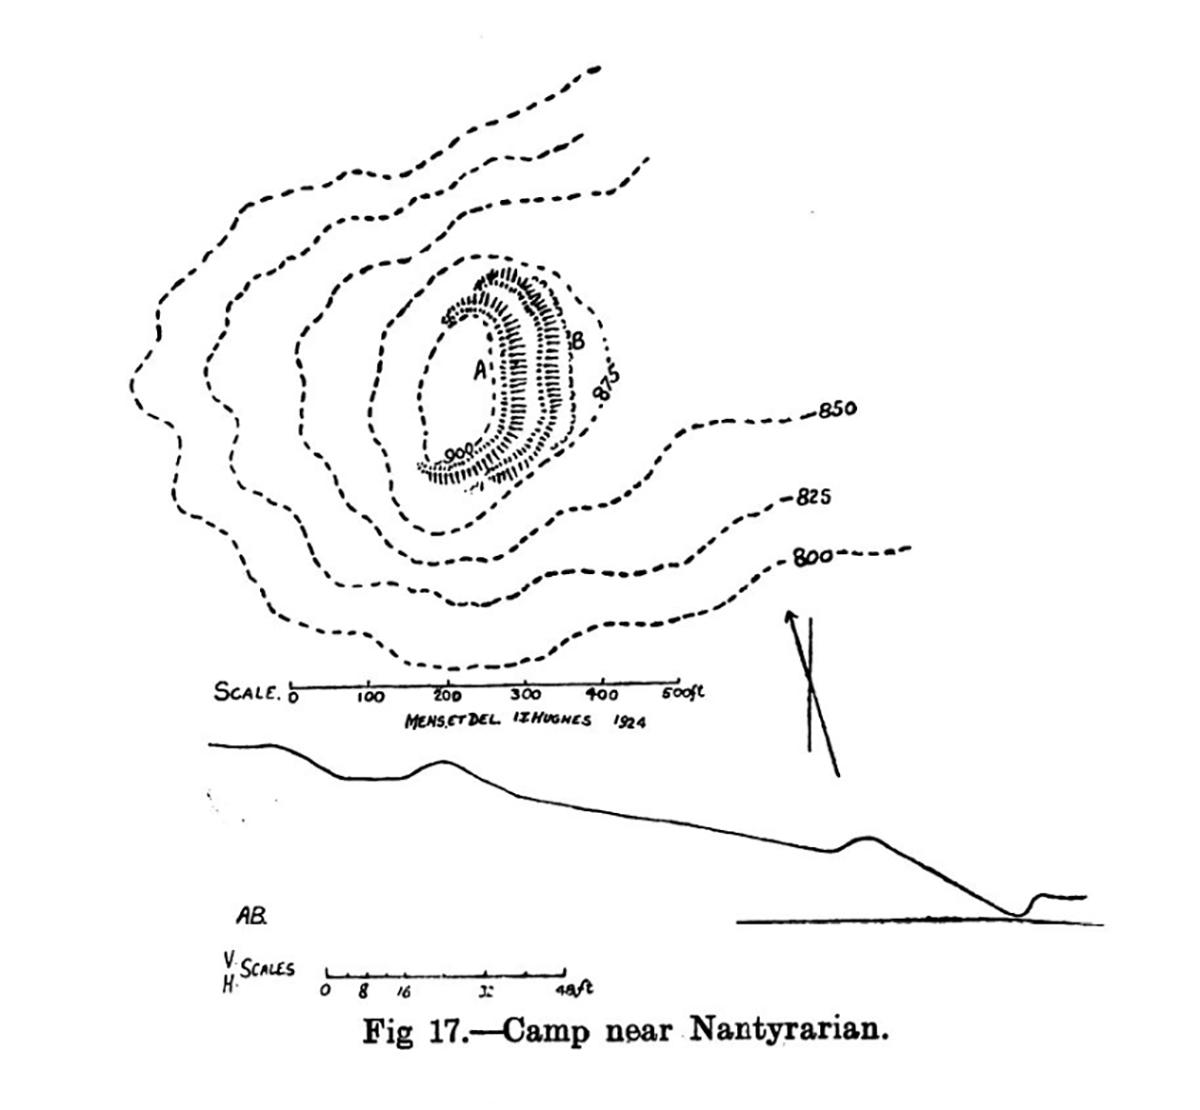 Site plan of Camp near Nantyrarian